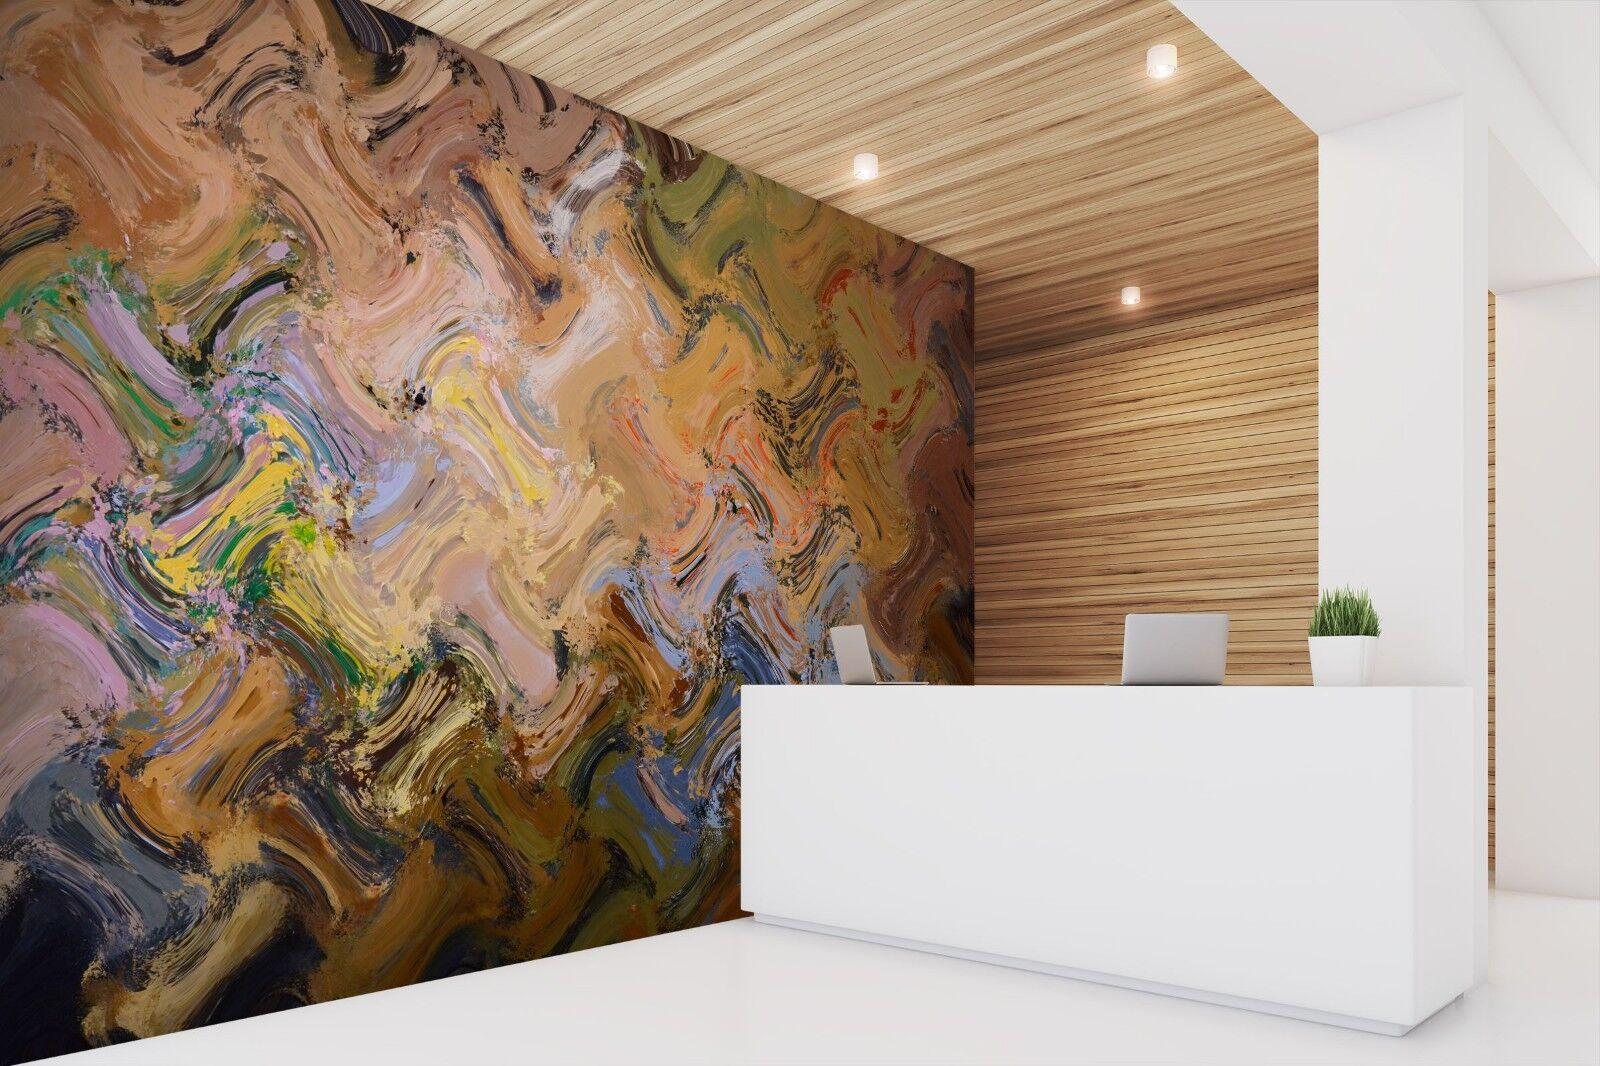 3D Palette Wave 871 Textur Fliesen Marmor Tapeten Abziehbild Tapete Wandbild